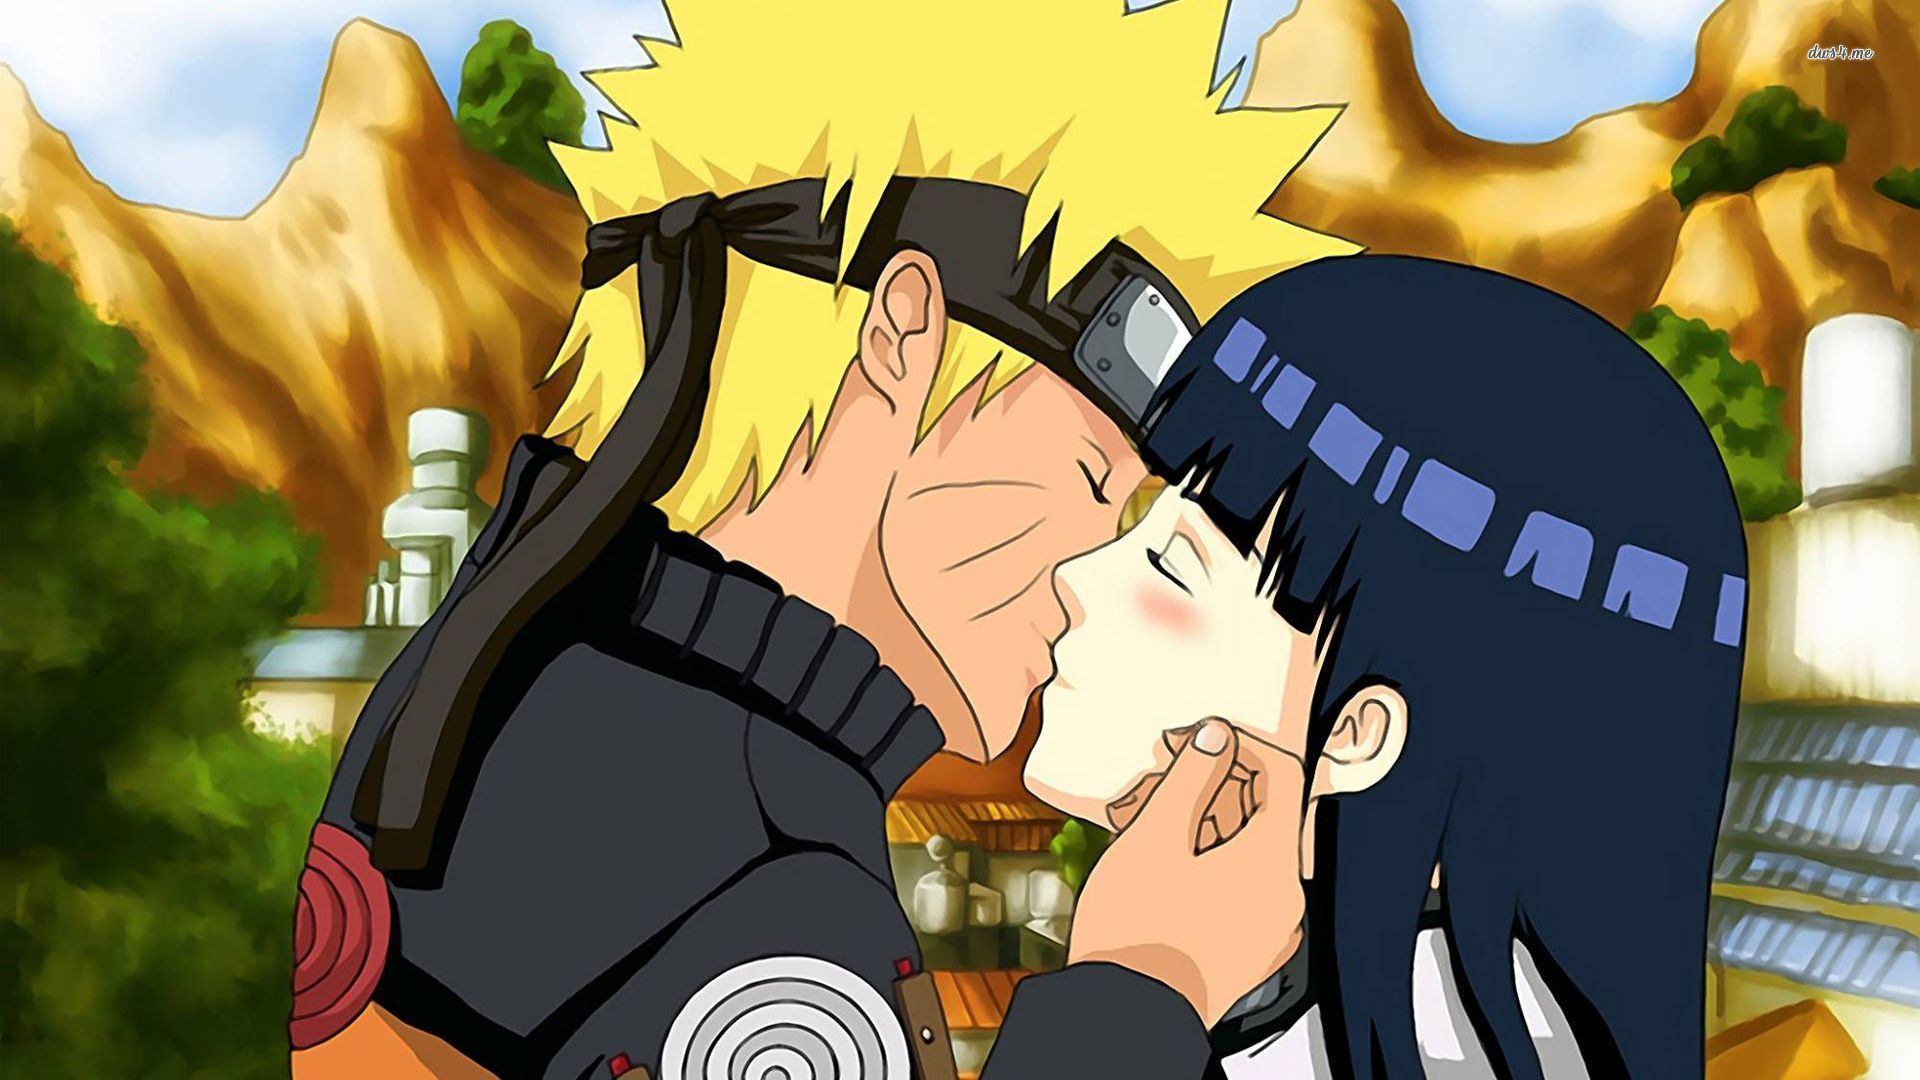 Good Wallpaper Naruto Couple - 8404d4305d5aa851f111ba9cd4b54465  Trends_5275.jpg